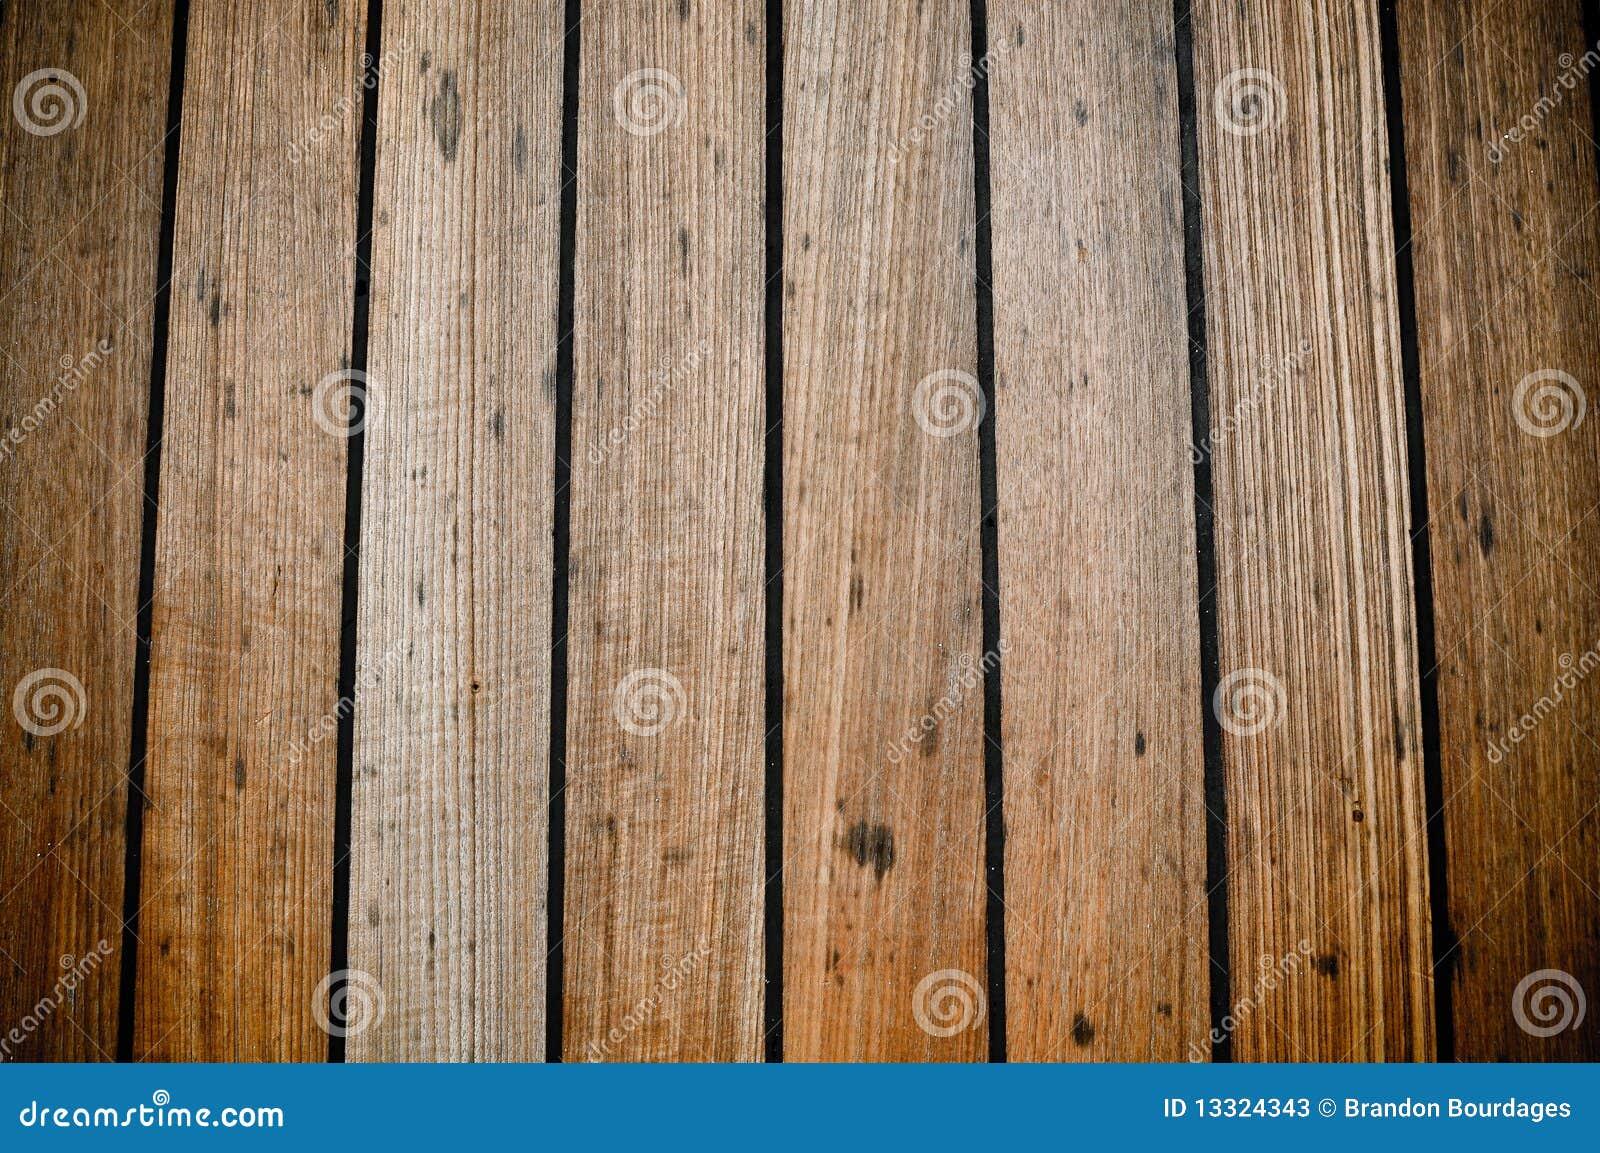 Grunge wooden ship deck planks background stock image